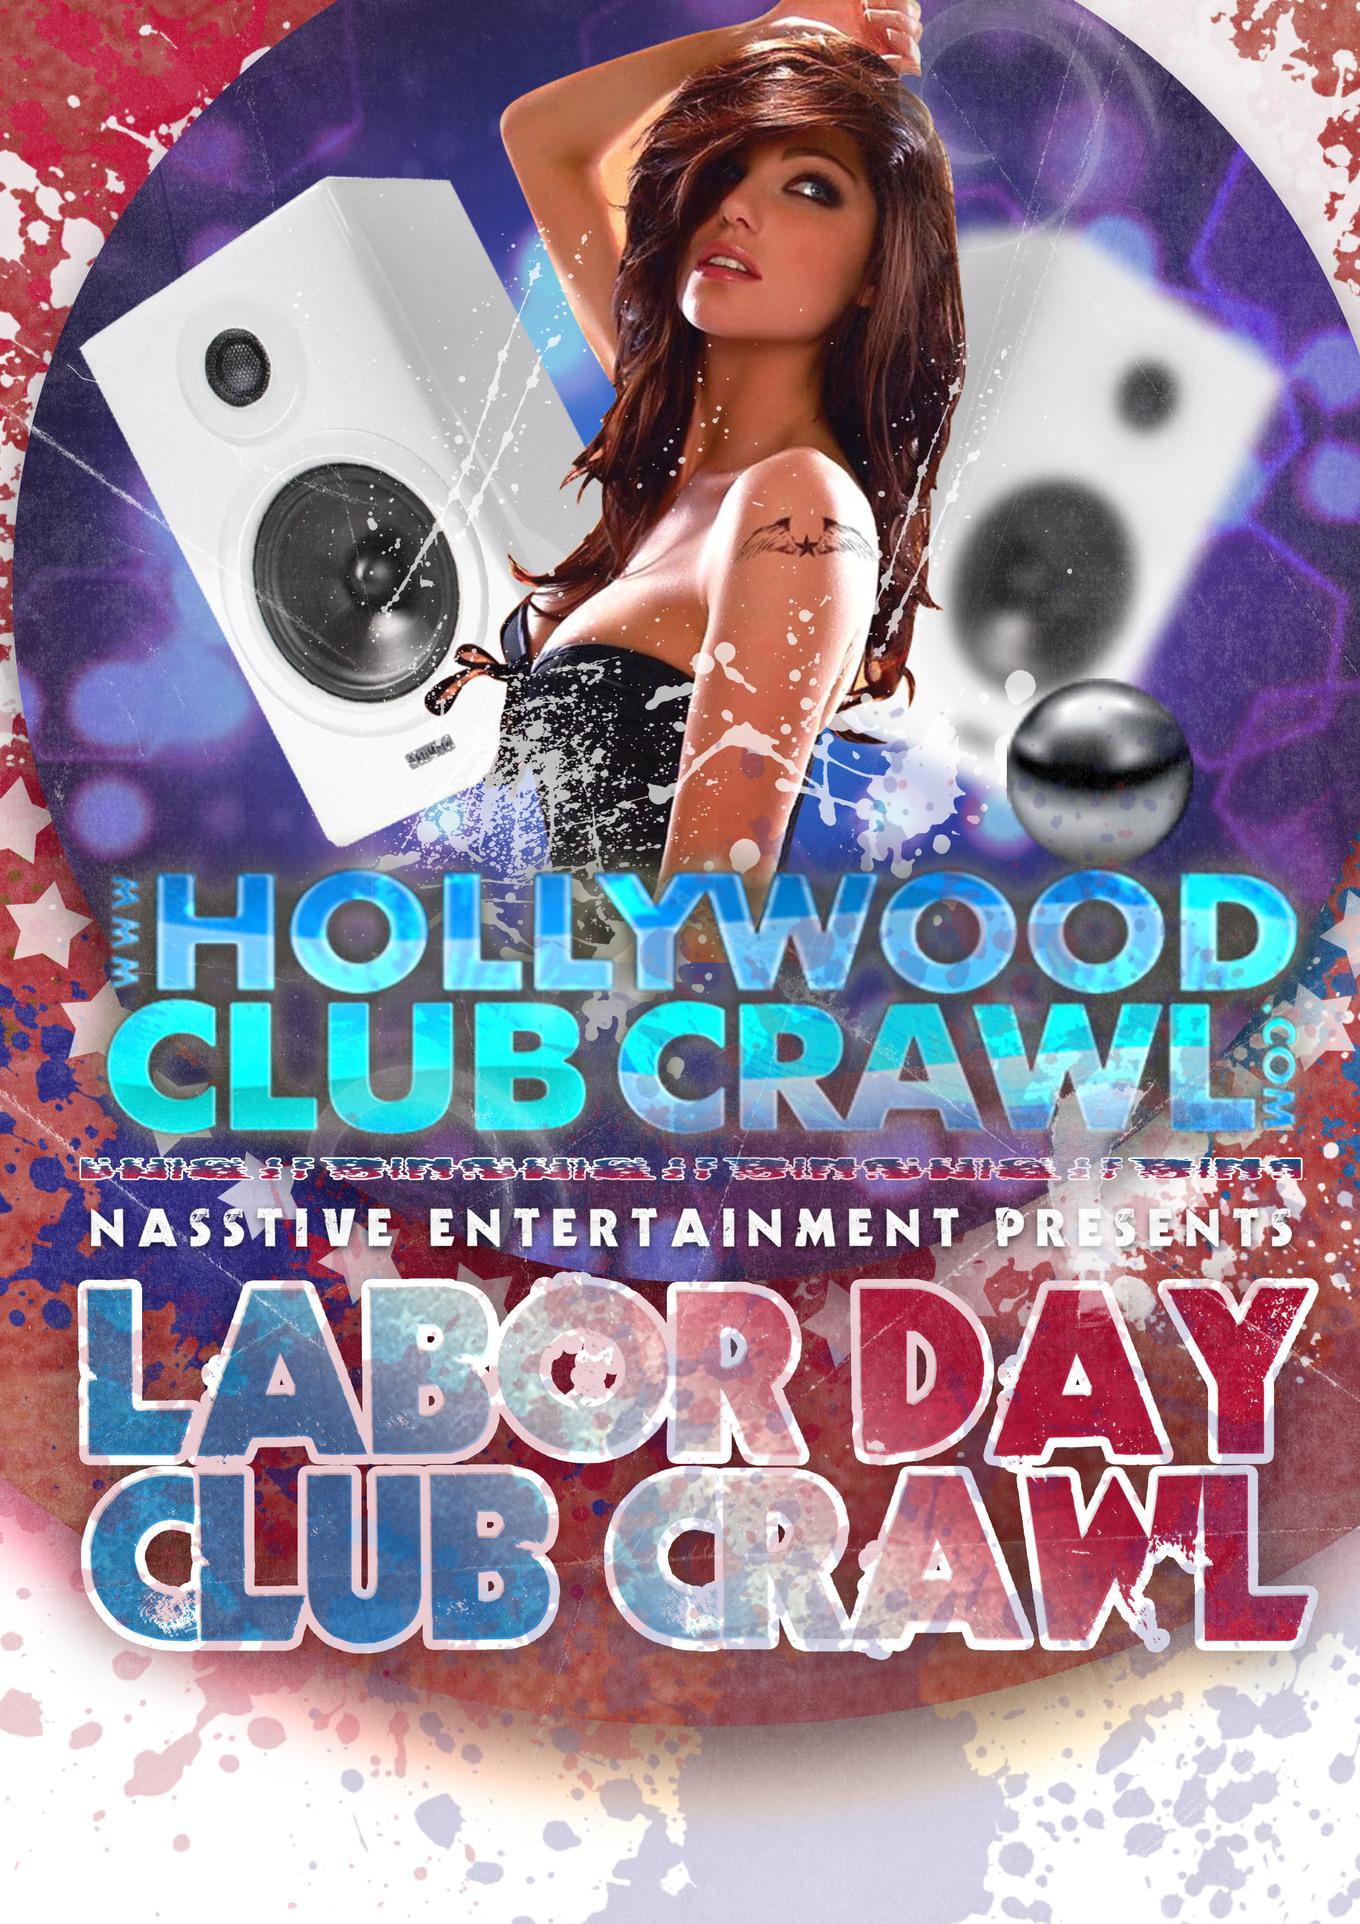 HOLLYWOOD LABOR DAY SUNDAY BAR & CLUB CRAWL TICKETS ARE NOW